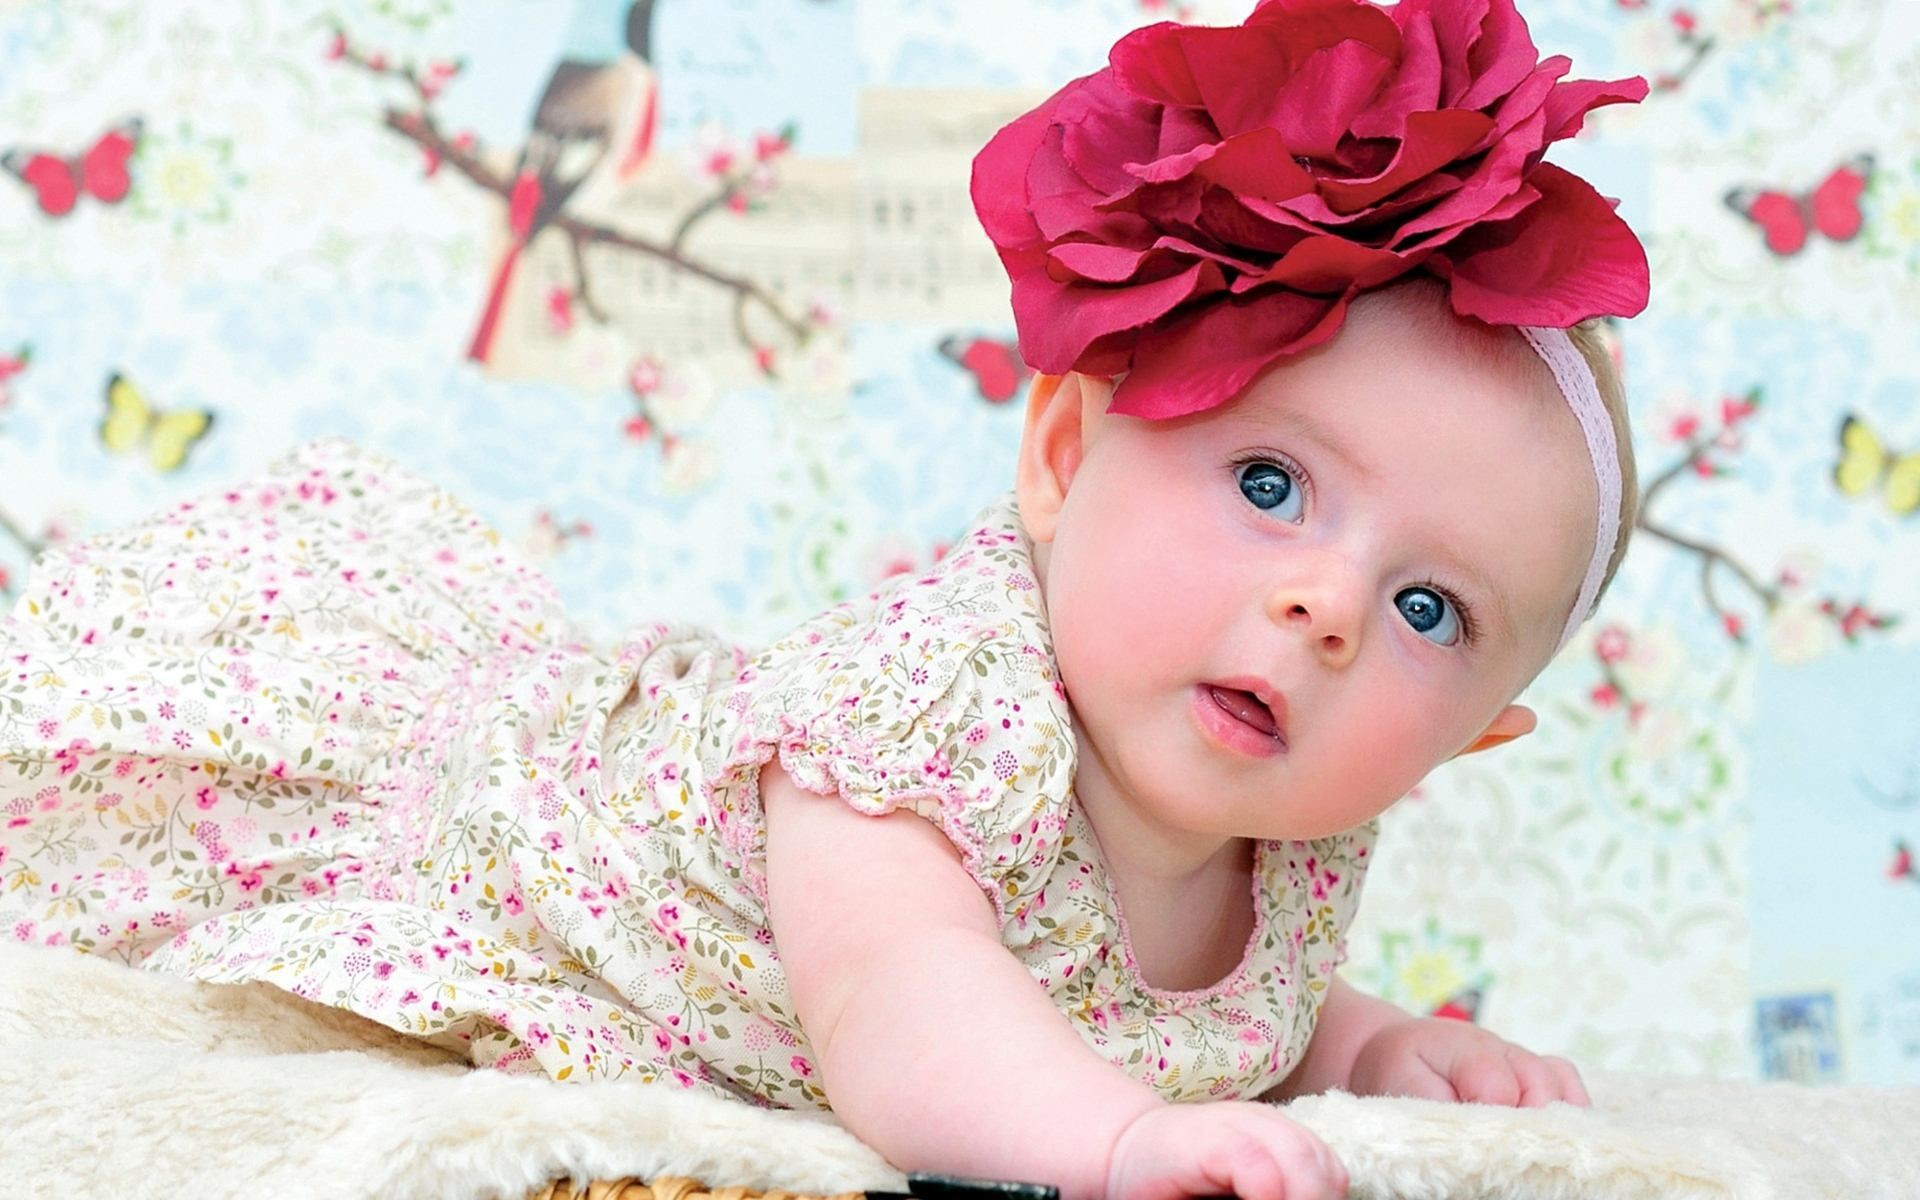 Baby Girl Wallpaper 1080p Baby Girl Wallpaper 1920×1200